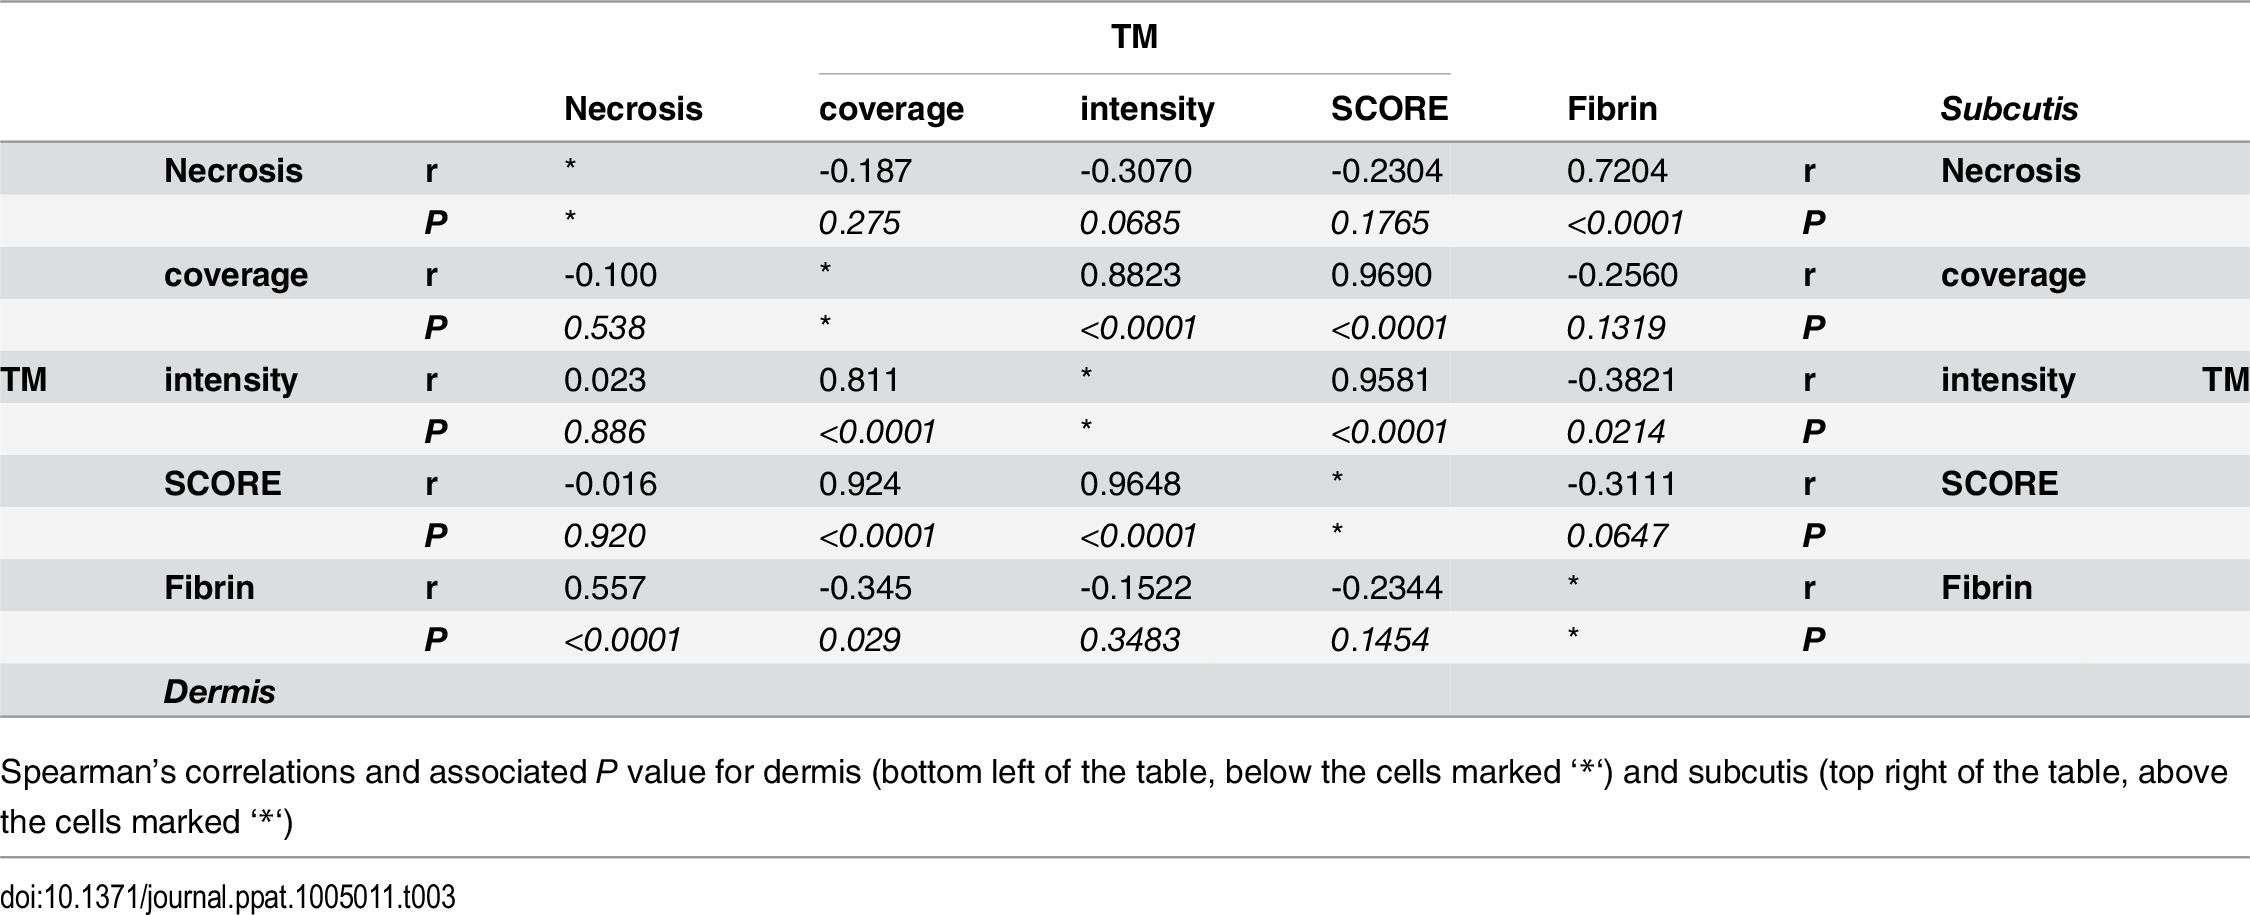 Spearman's correlation of histopathology/immunohistochemistry scoring.